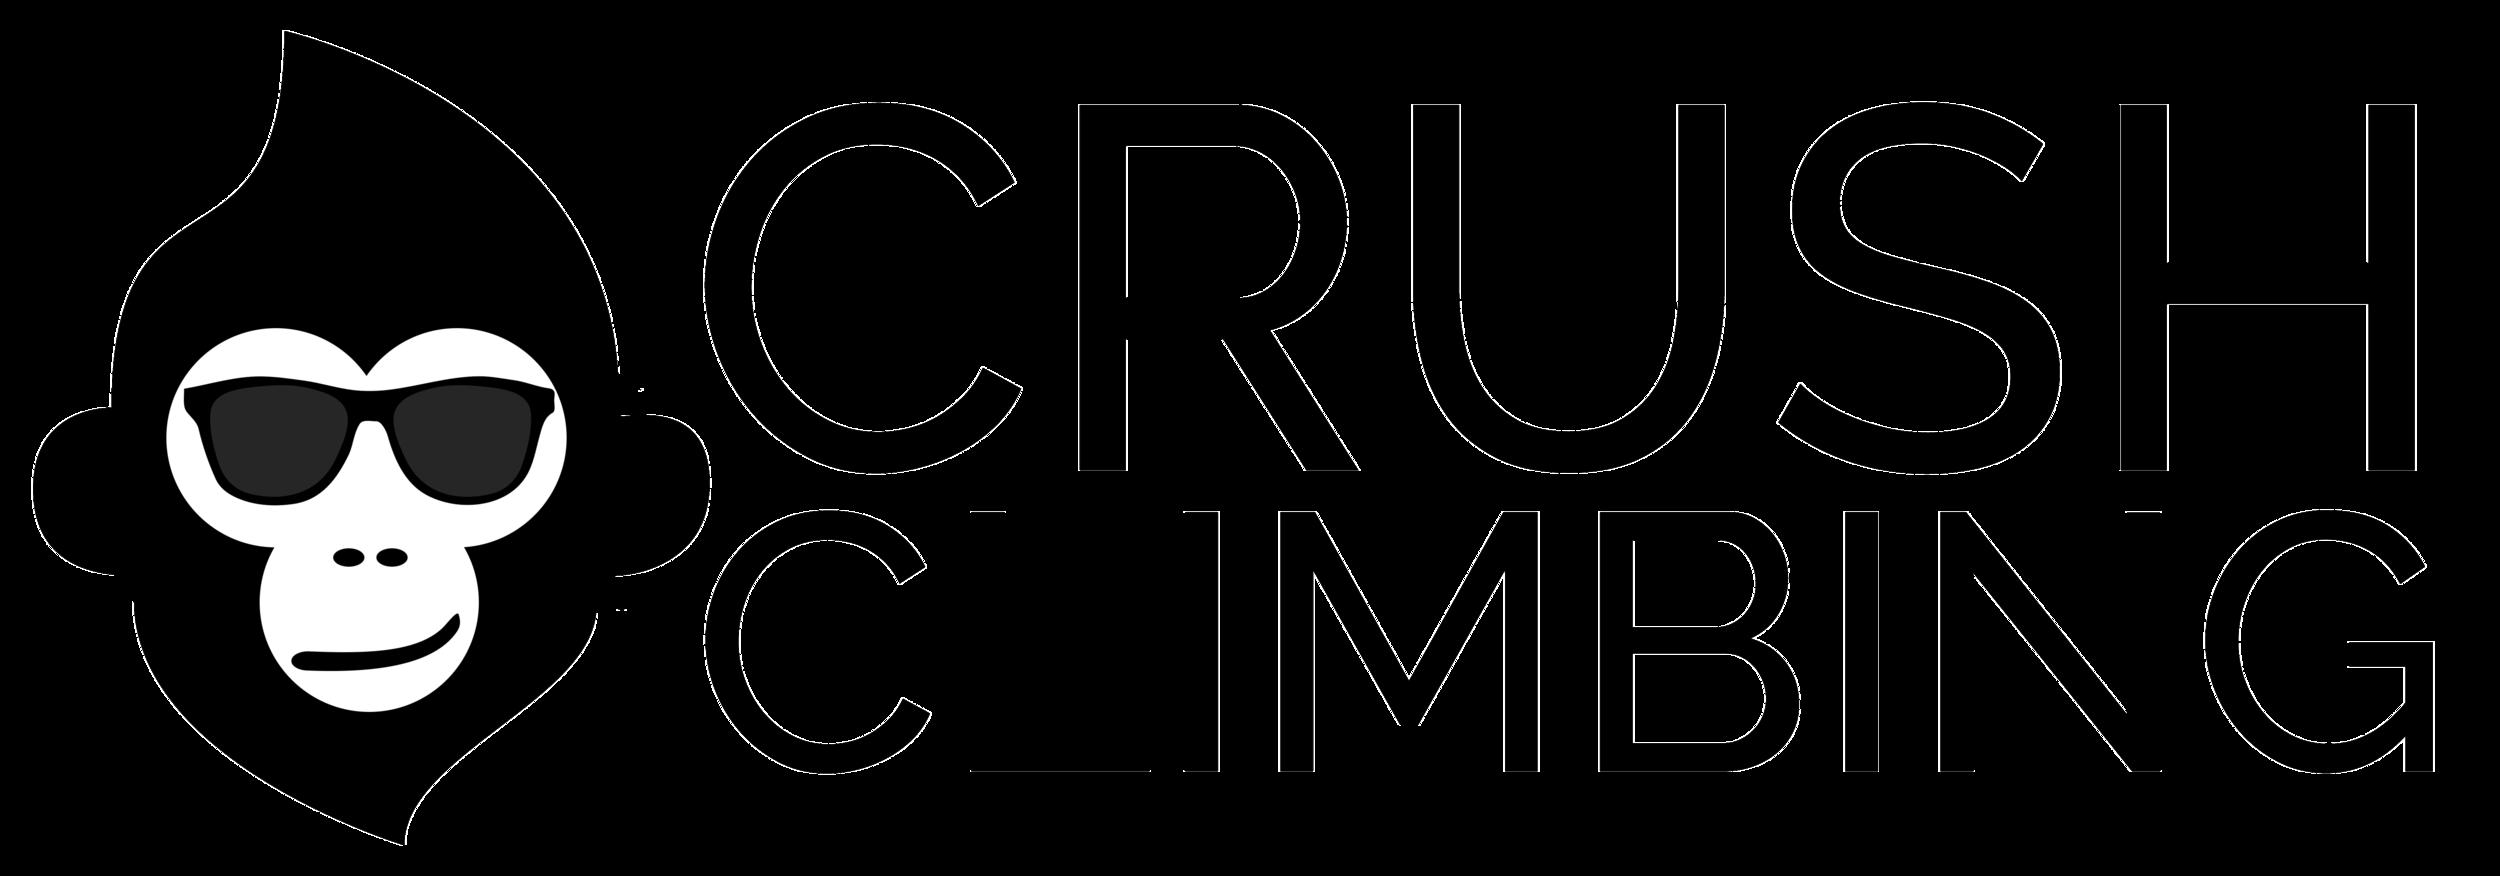 Crush-Climbing-Logo-and-Text.png